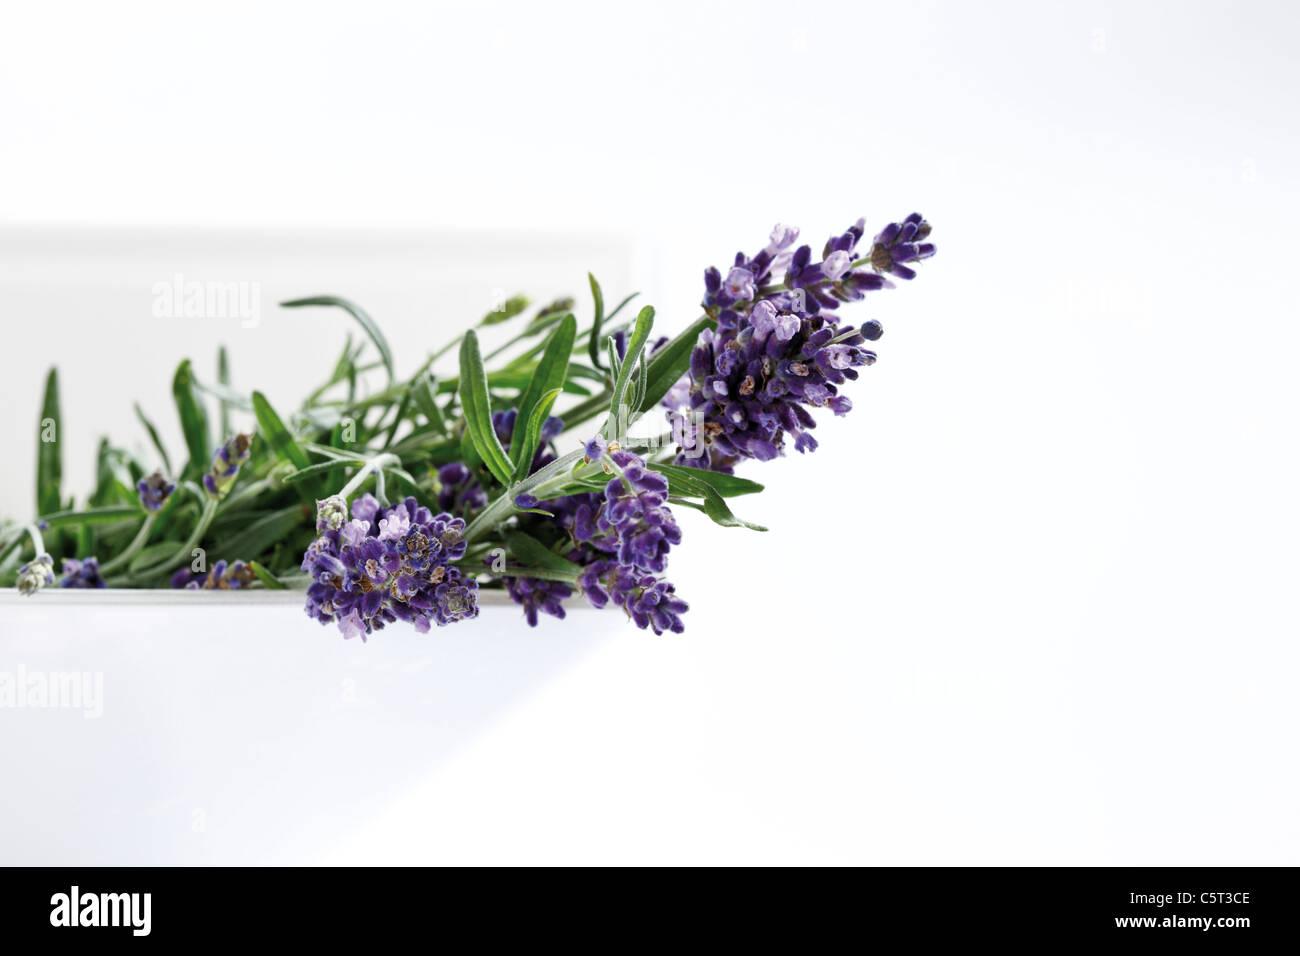 Bunch of lavender (Lavandula angustifolia) - Stock Image